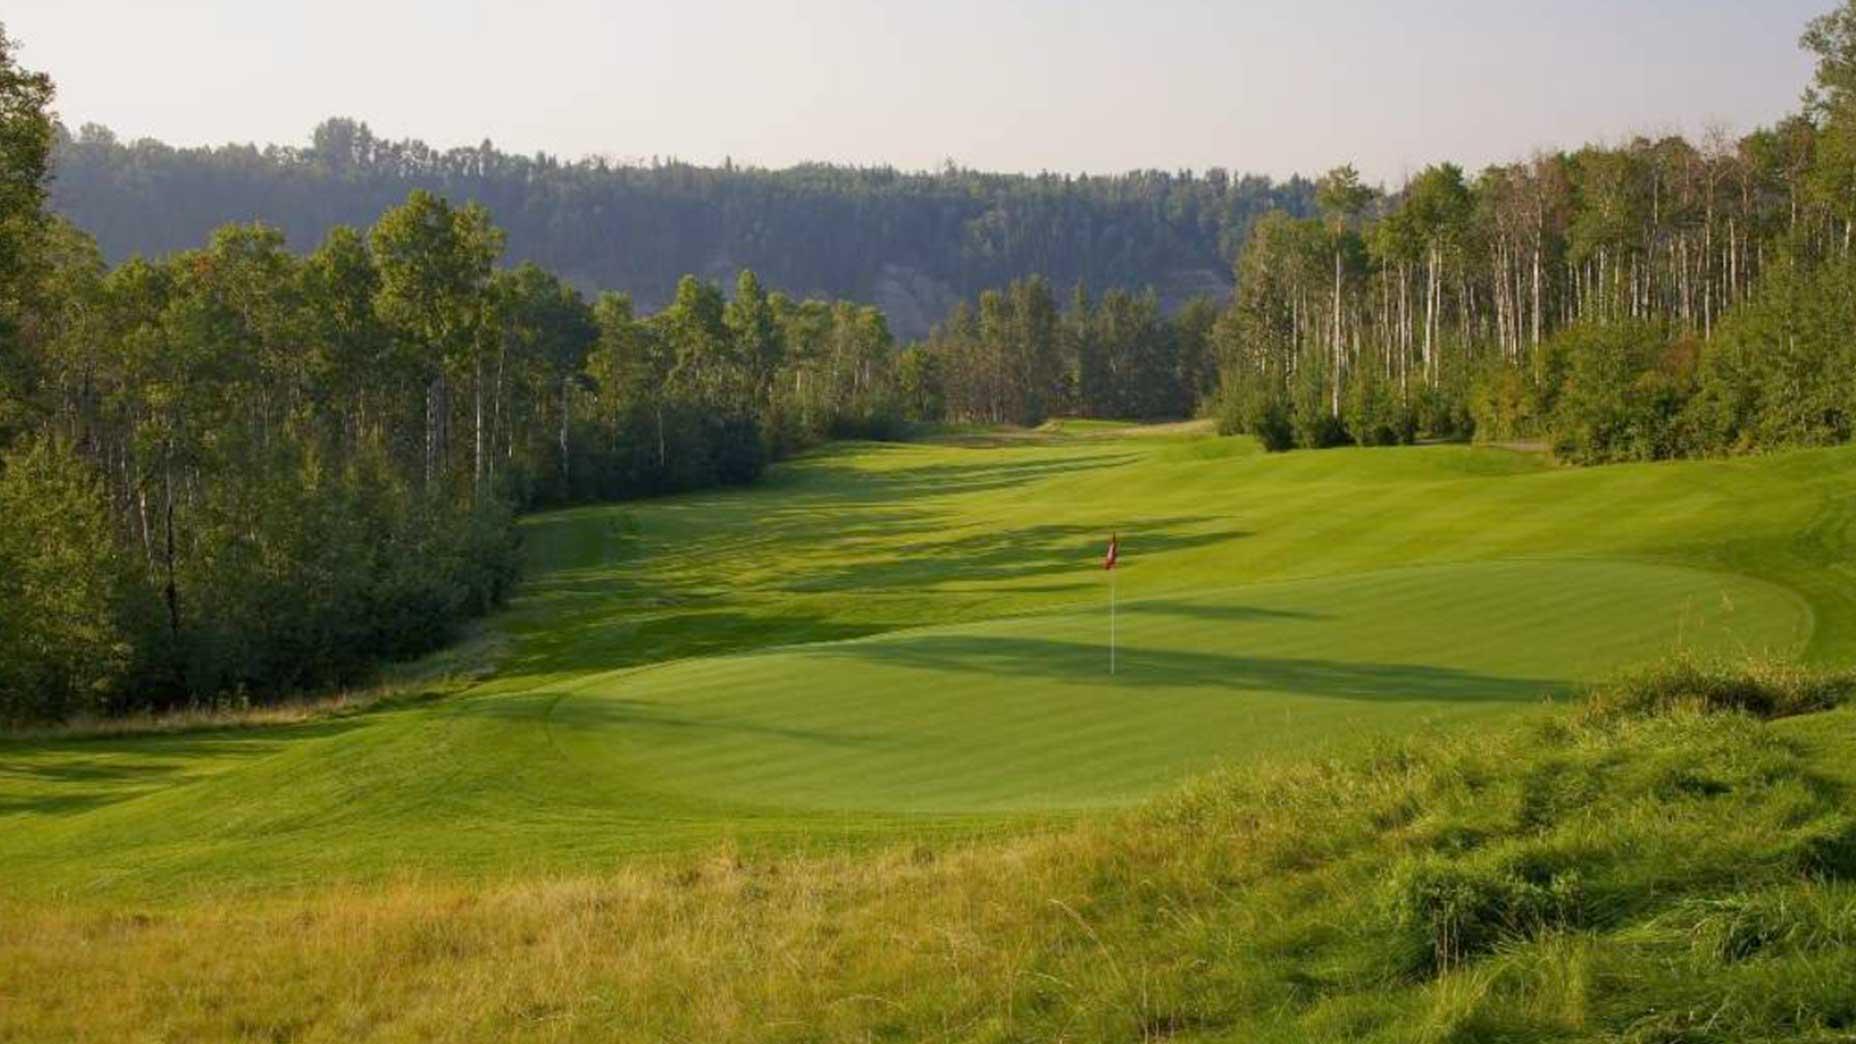 Blackhawk golf course in Canada.